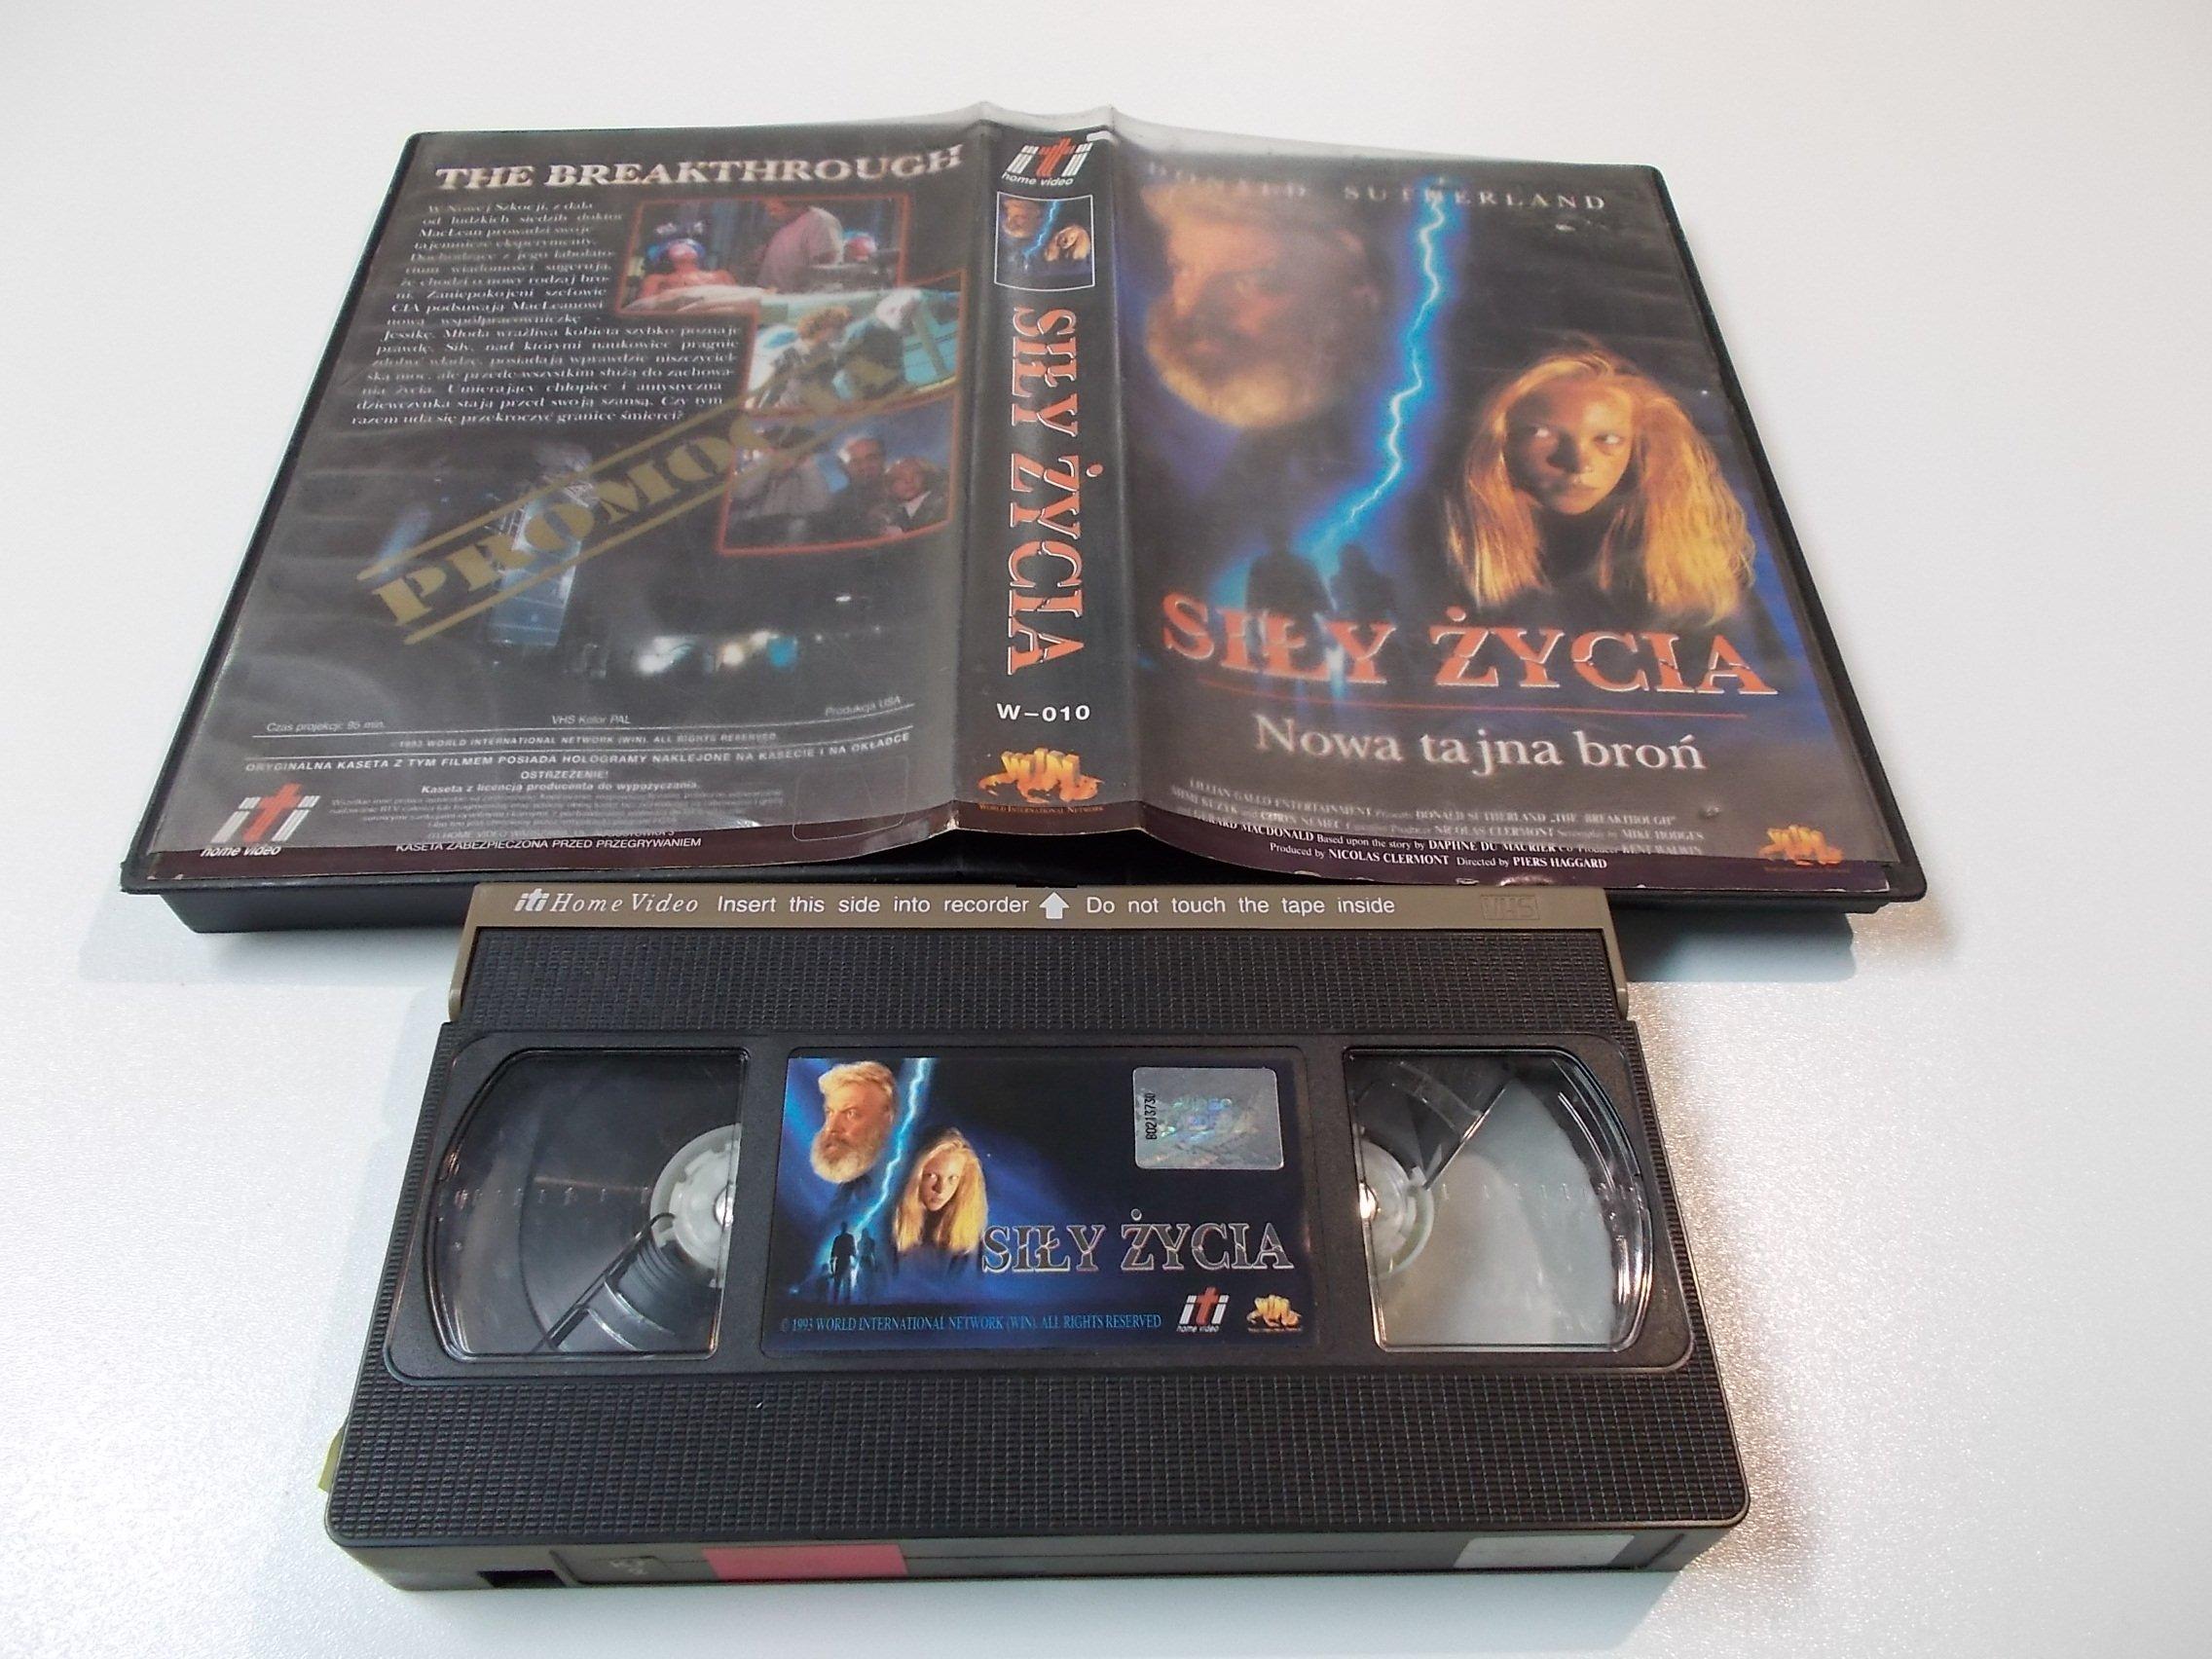 SIŁY ŻYCIA - kaseta Video VHS - 1420 Sklep